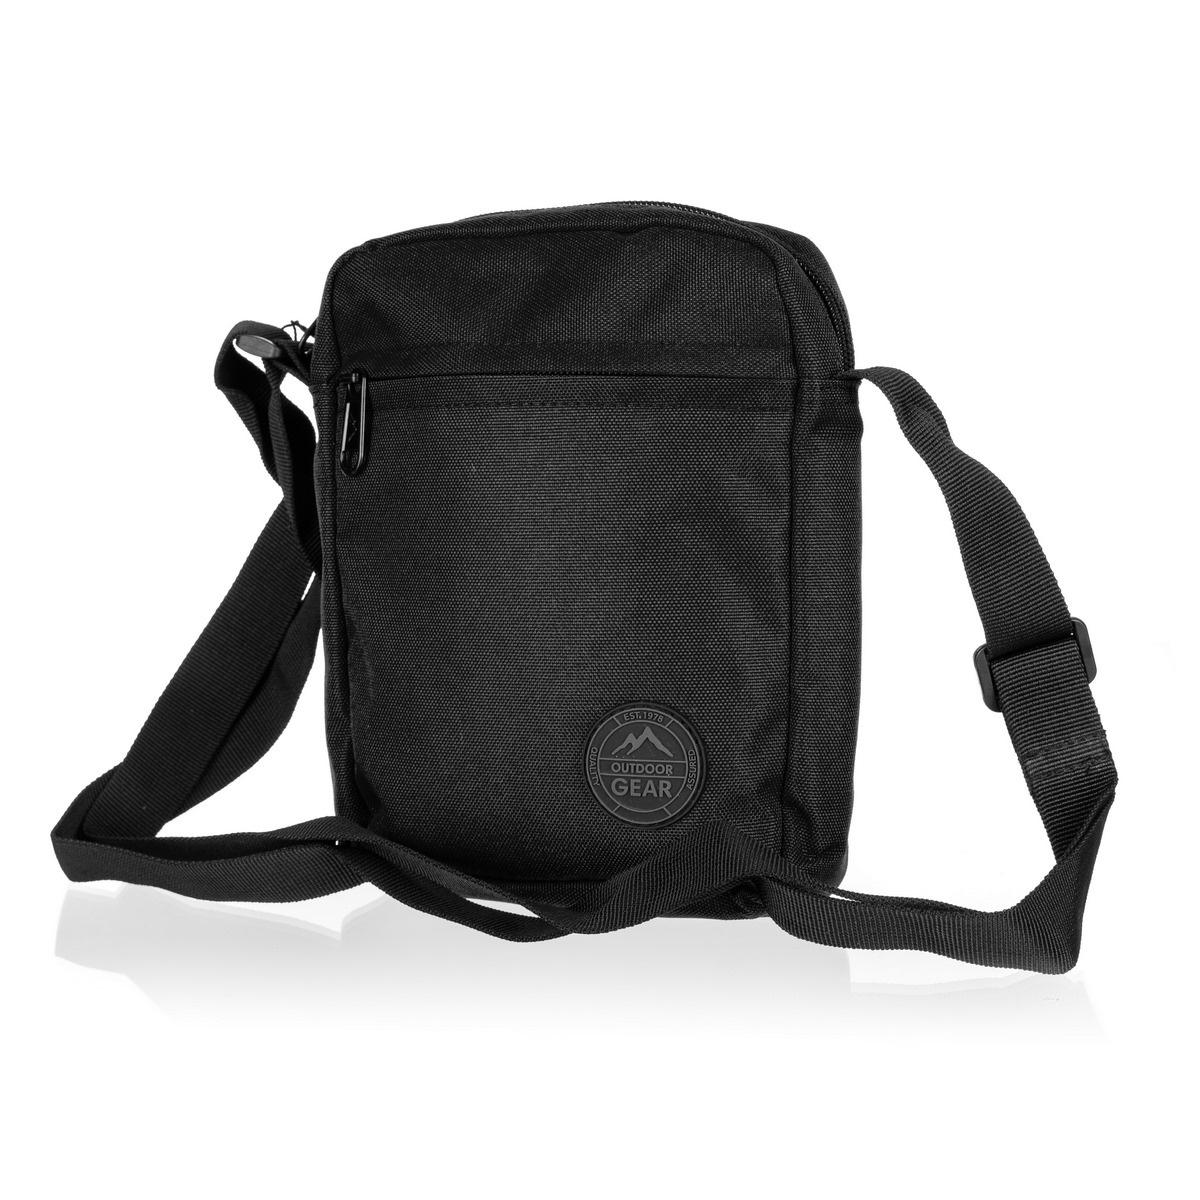 Outdoor Gear Taška přes rameno Scale černá, 16 x 20 x 5 cm